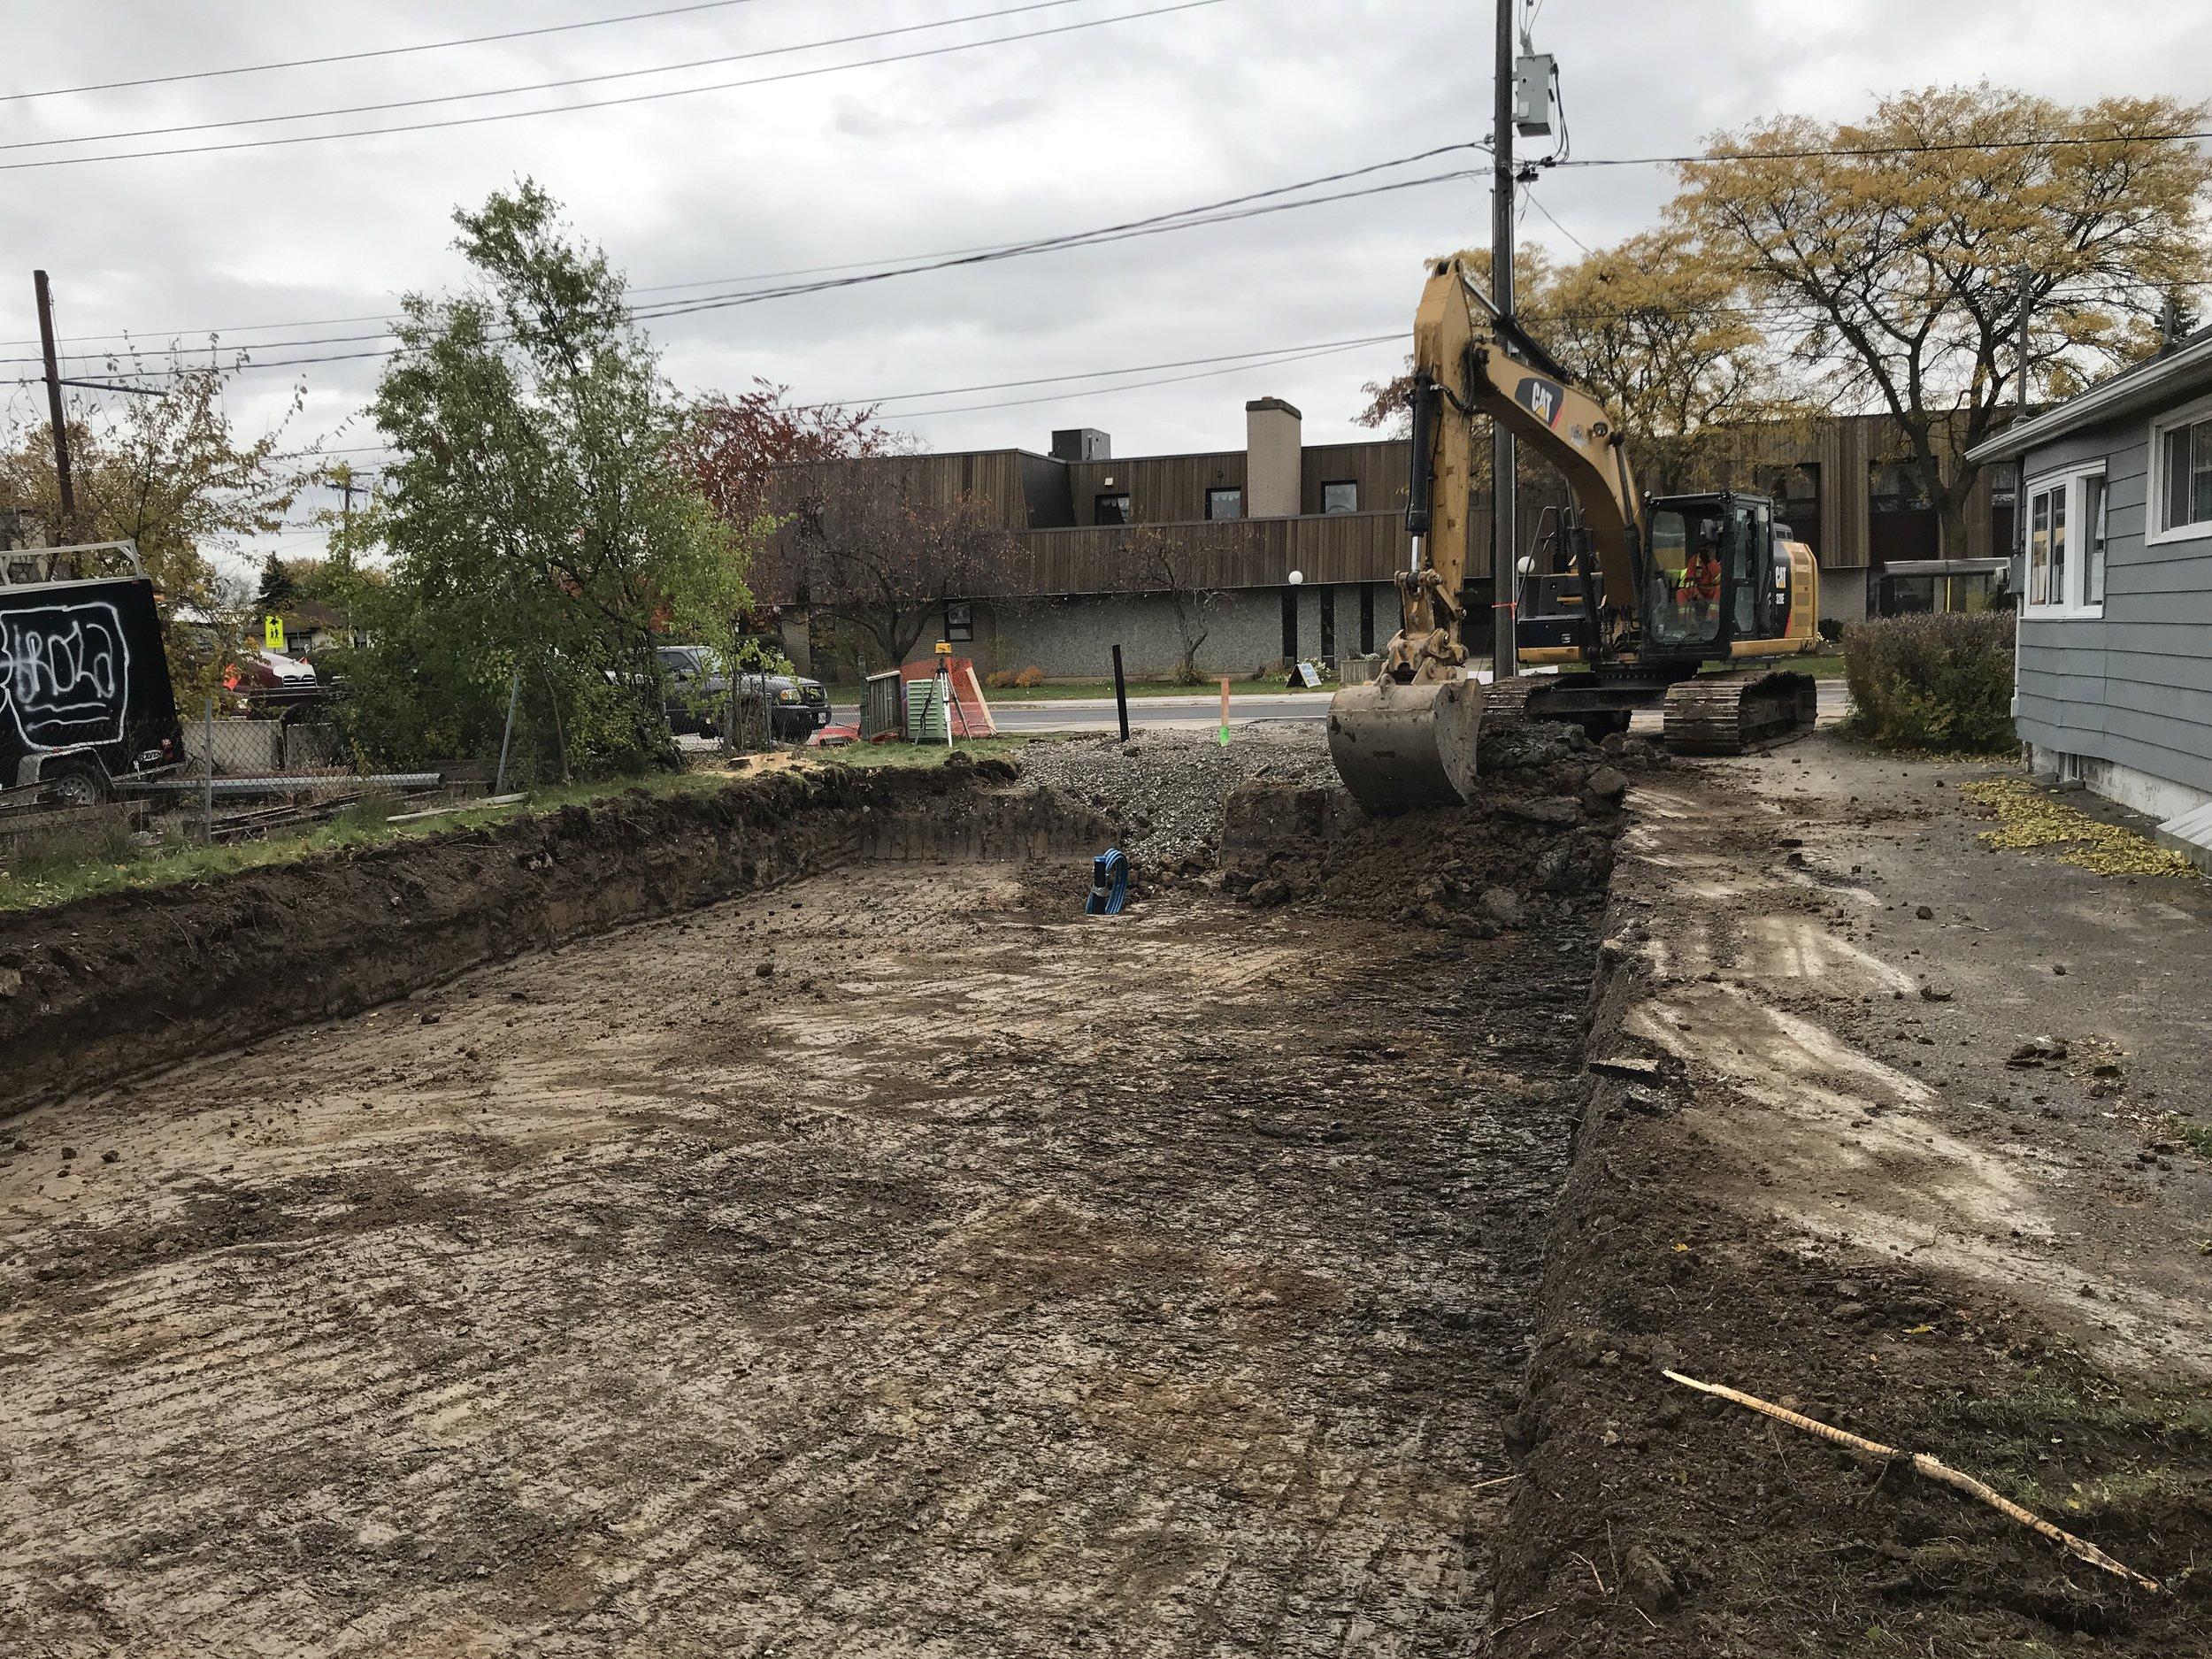 The excavator at work.